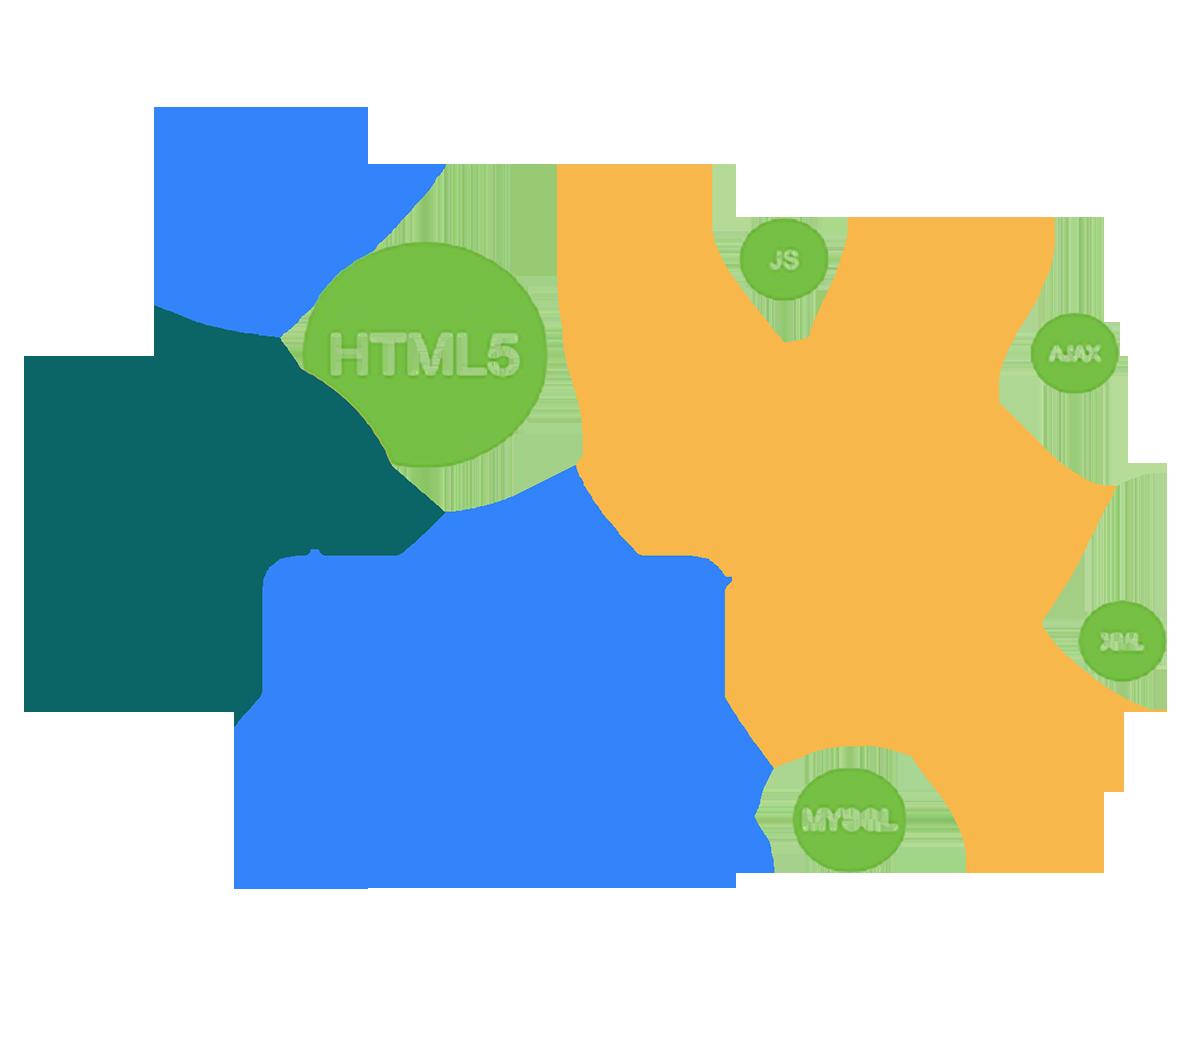 custom-web-development-introductory-paragraph-image